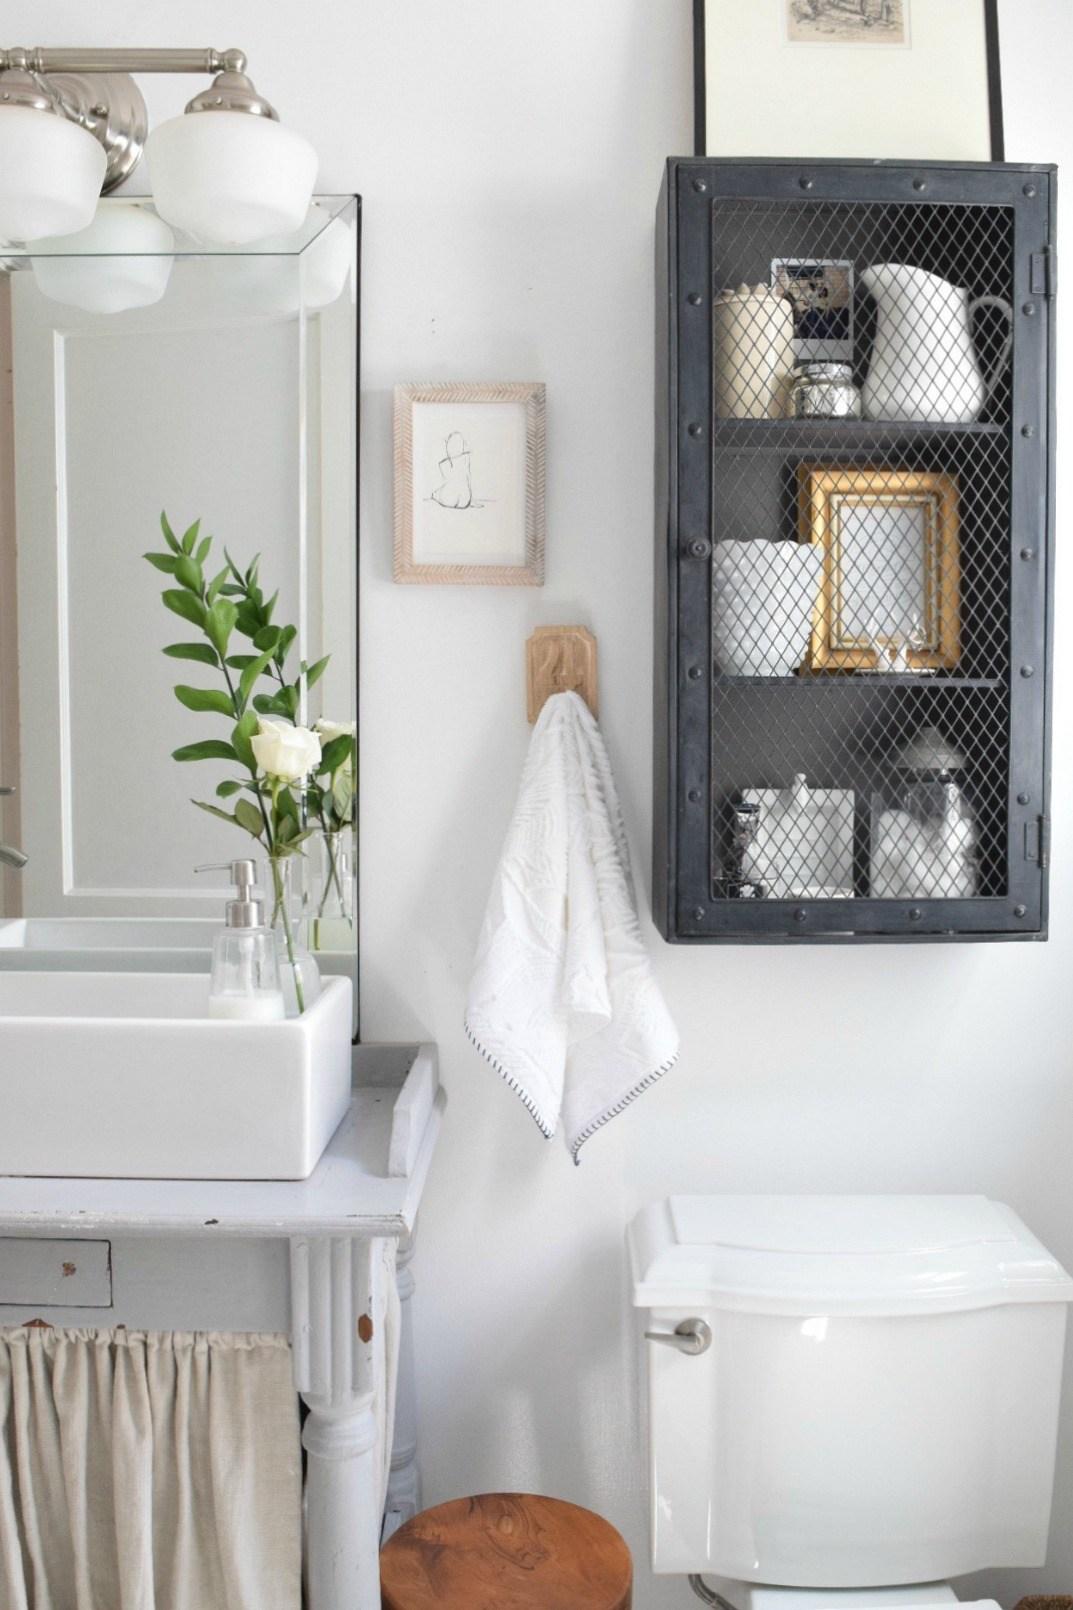 petite salle de bain personnaliser meuble mural